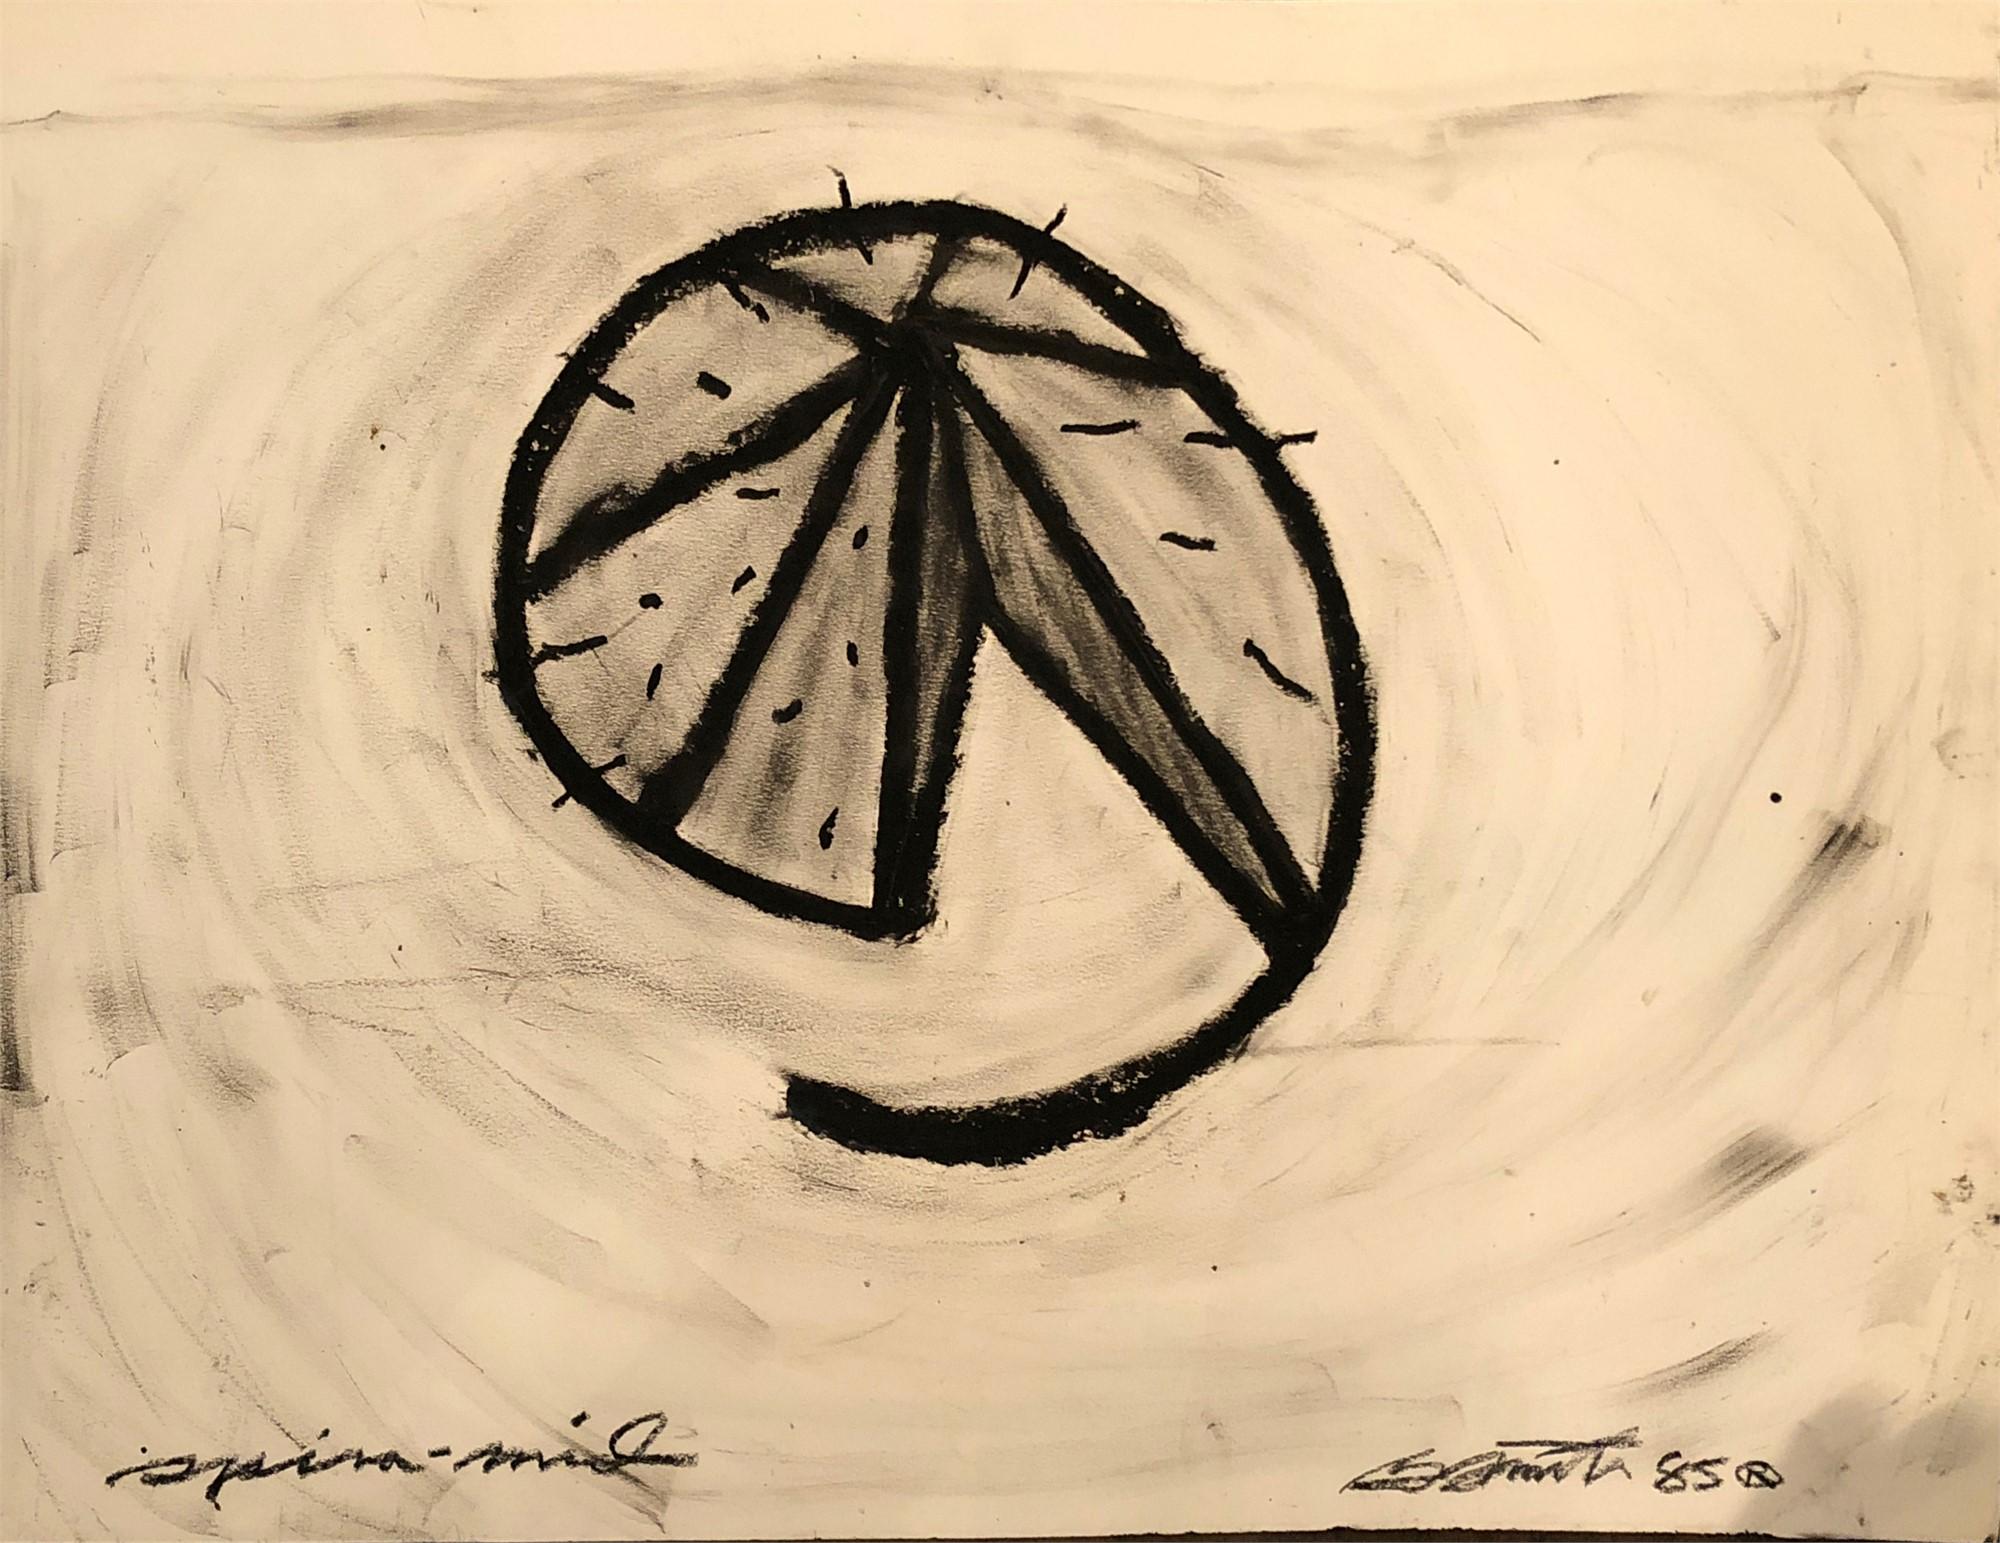 Spira-Mid I by George Smith